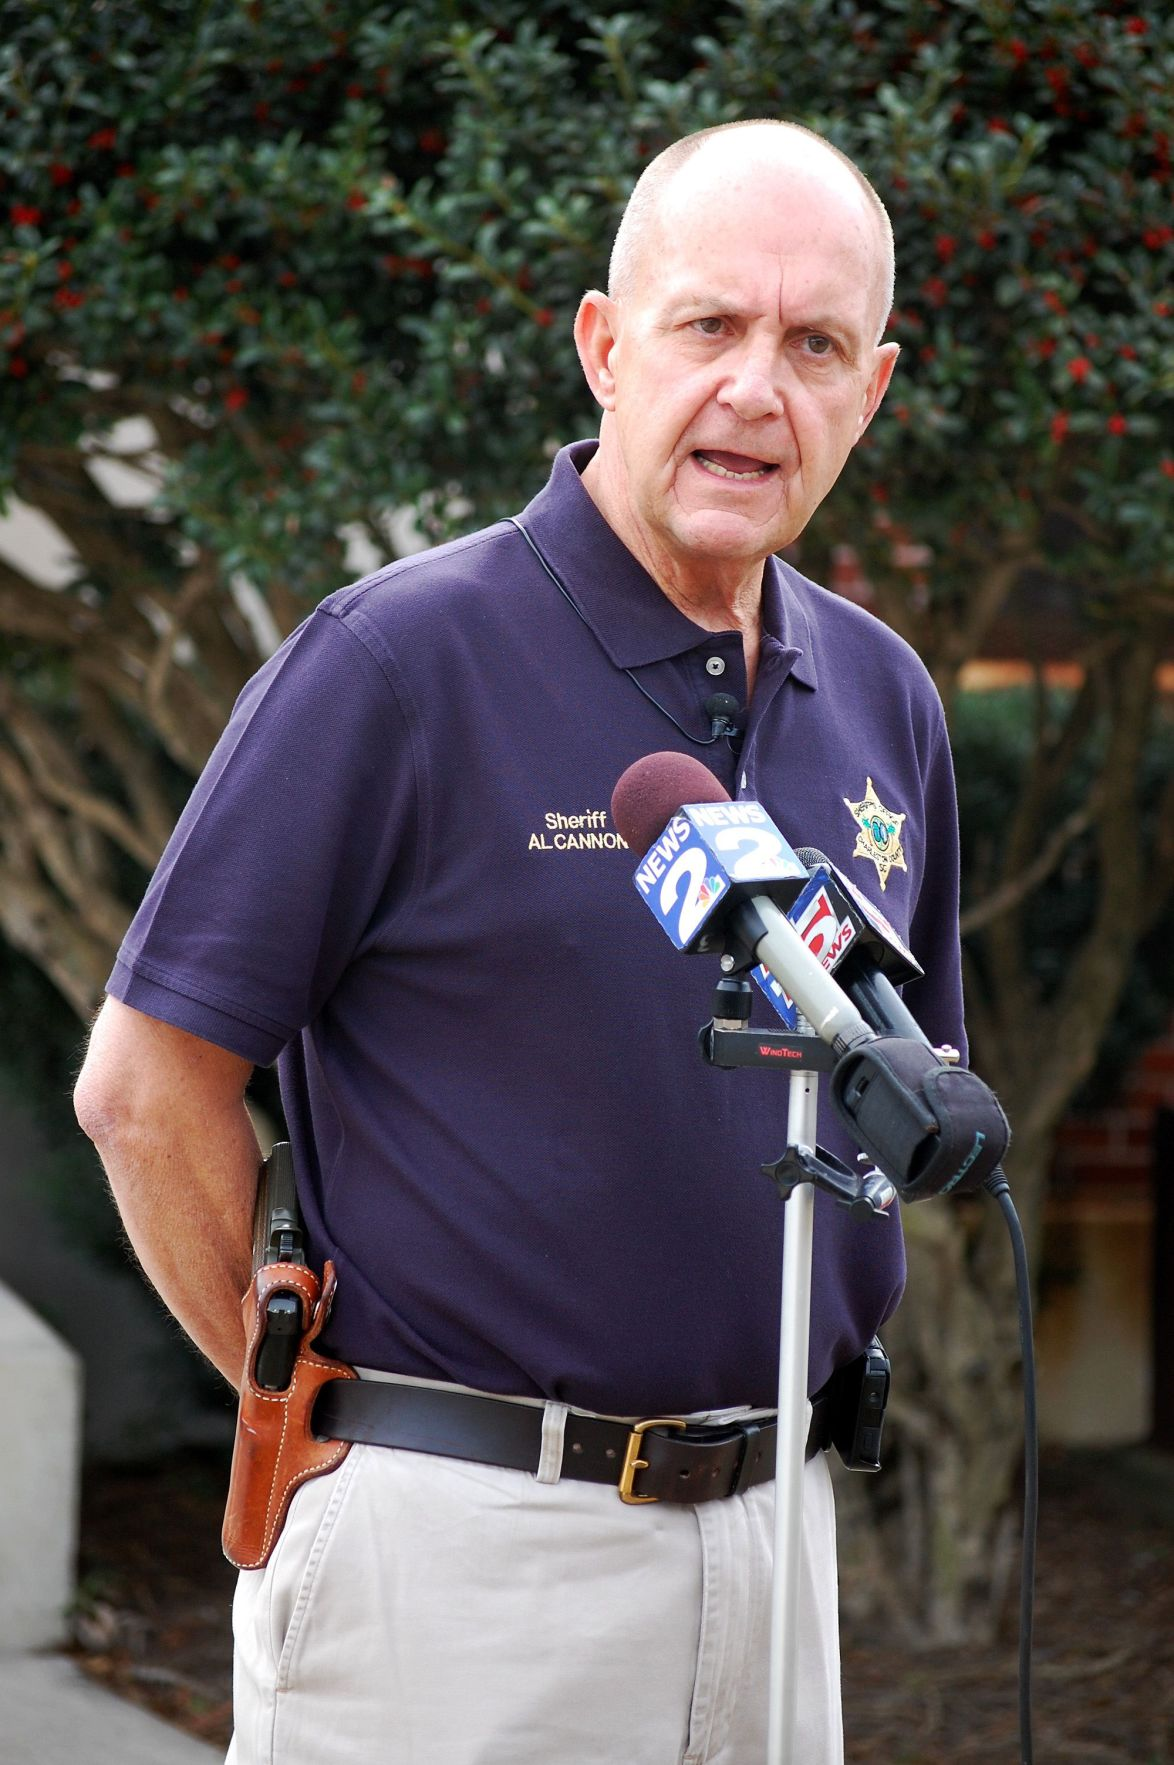 Arrests of S.C. sheriffs concern colleagues